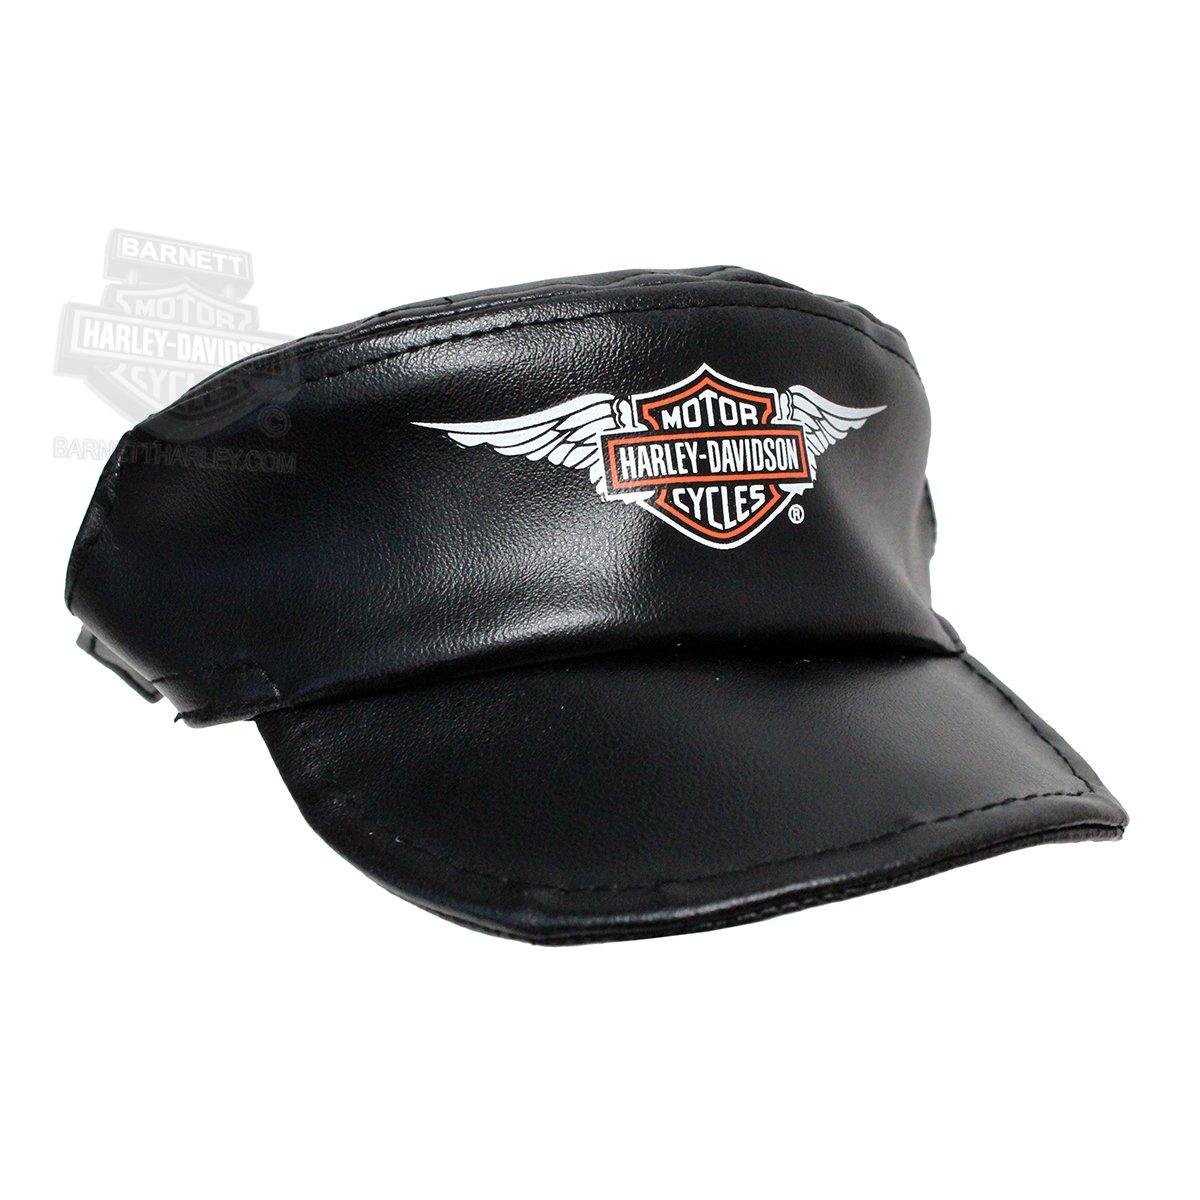 Harley-Davidson Pet Cap Black Vinyl - SM